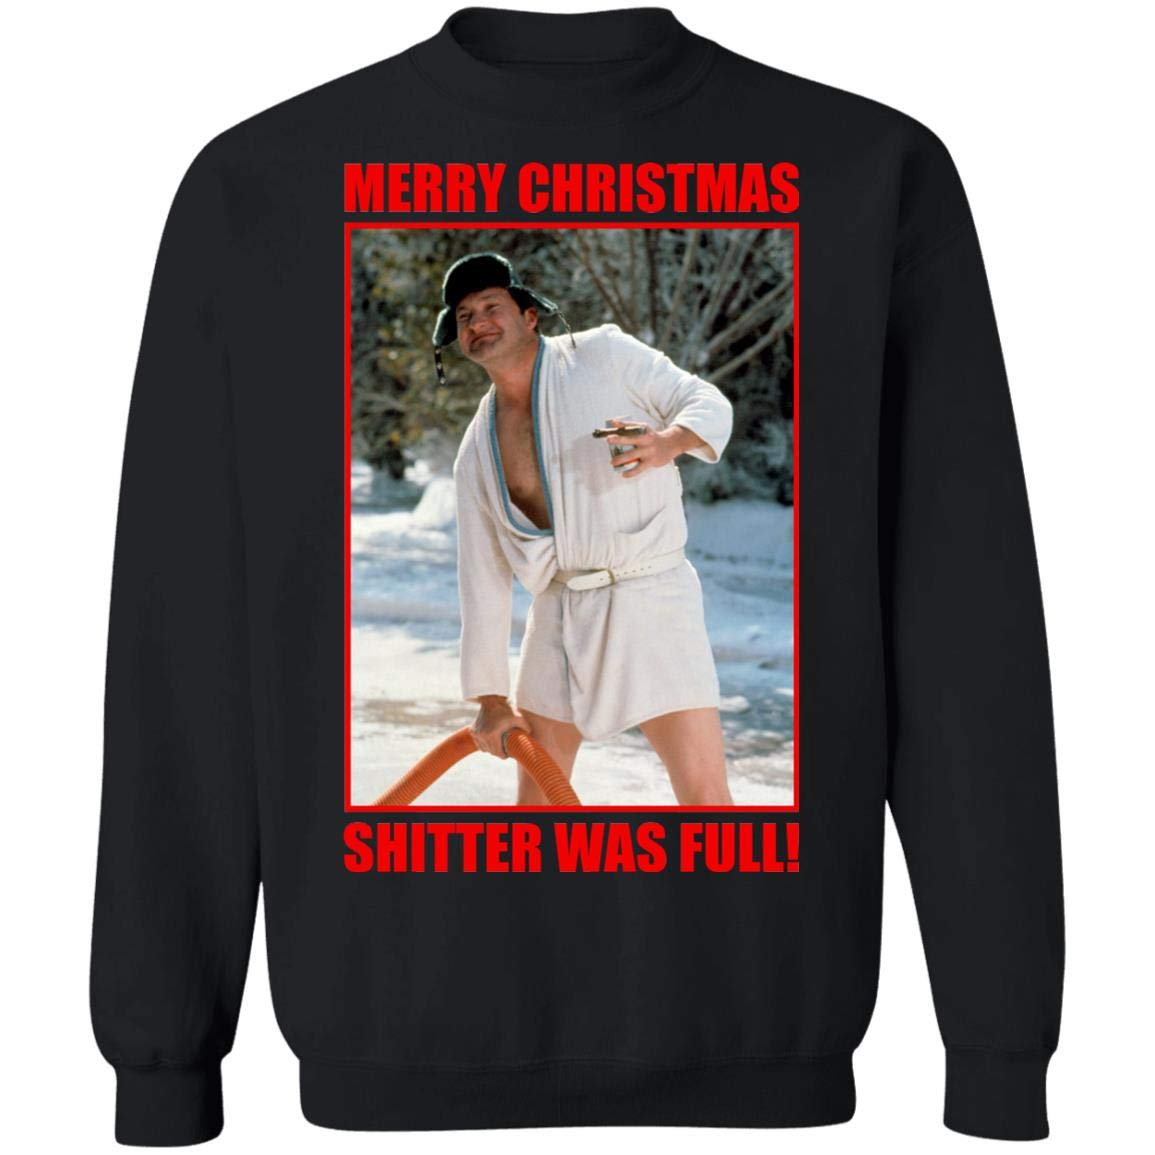 GearPowers Cousin Eddie Merry Christmas Shitter was Full National Christmas Vacation Sweater Unisex Sweatshirt